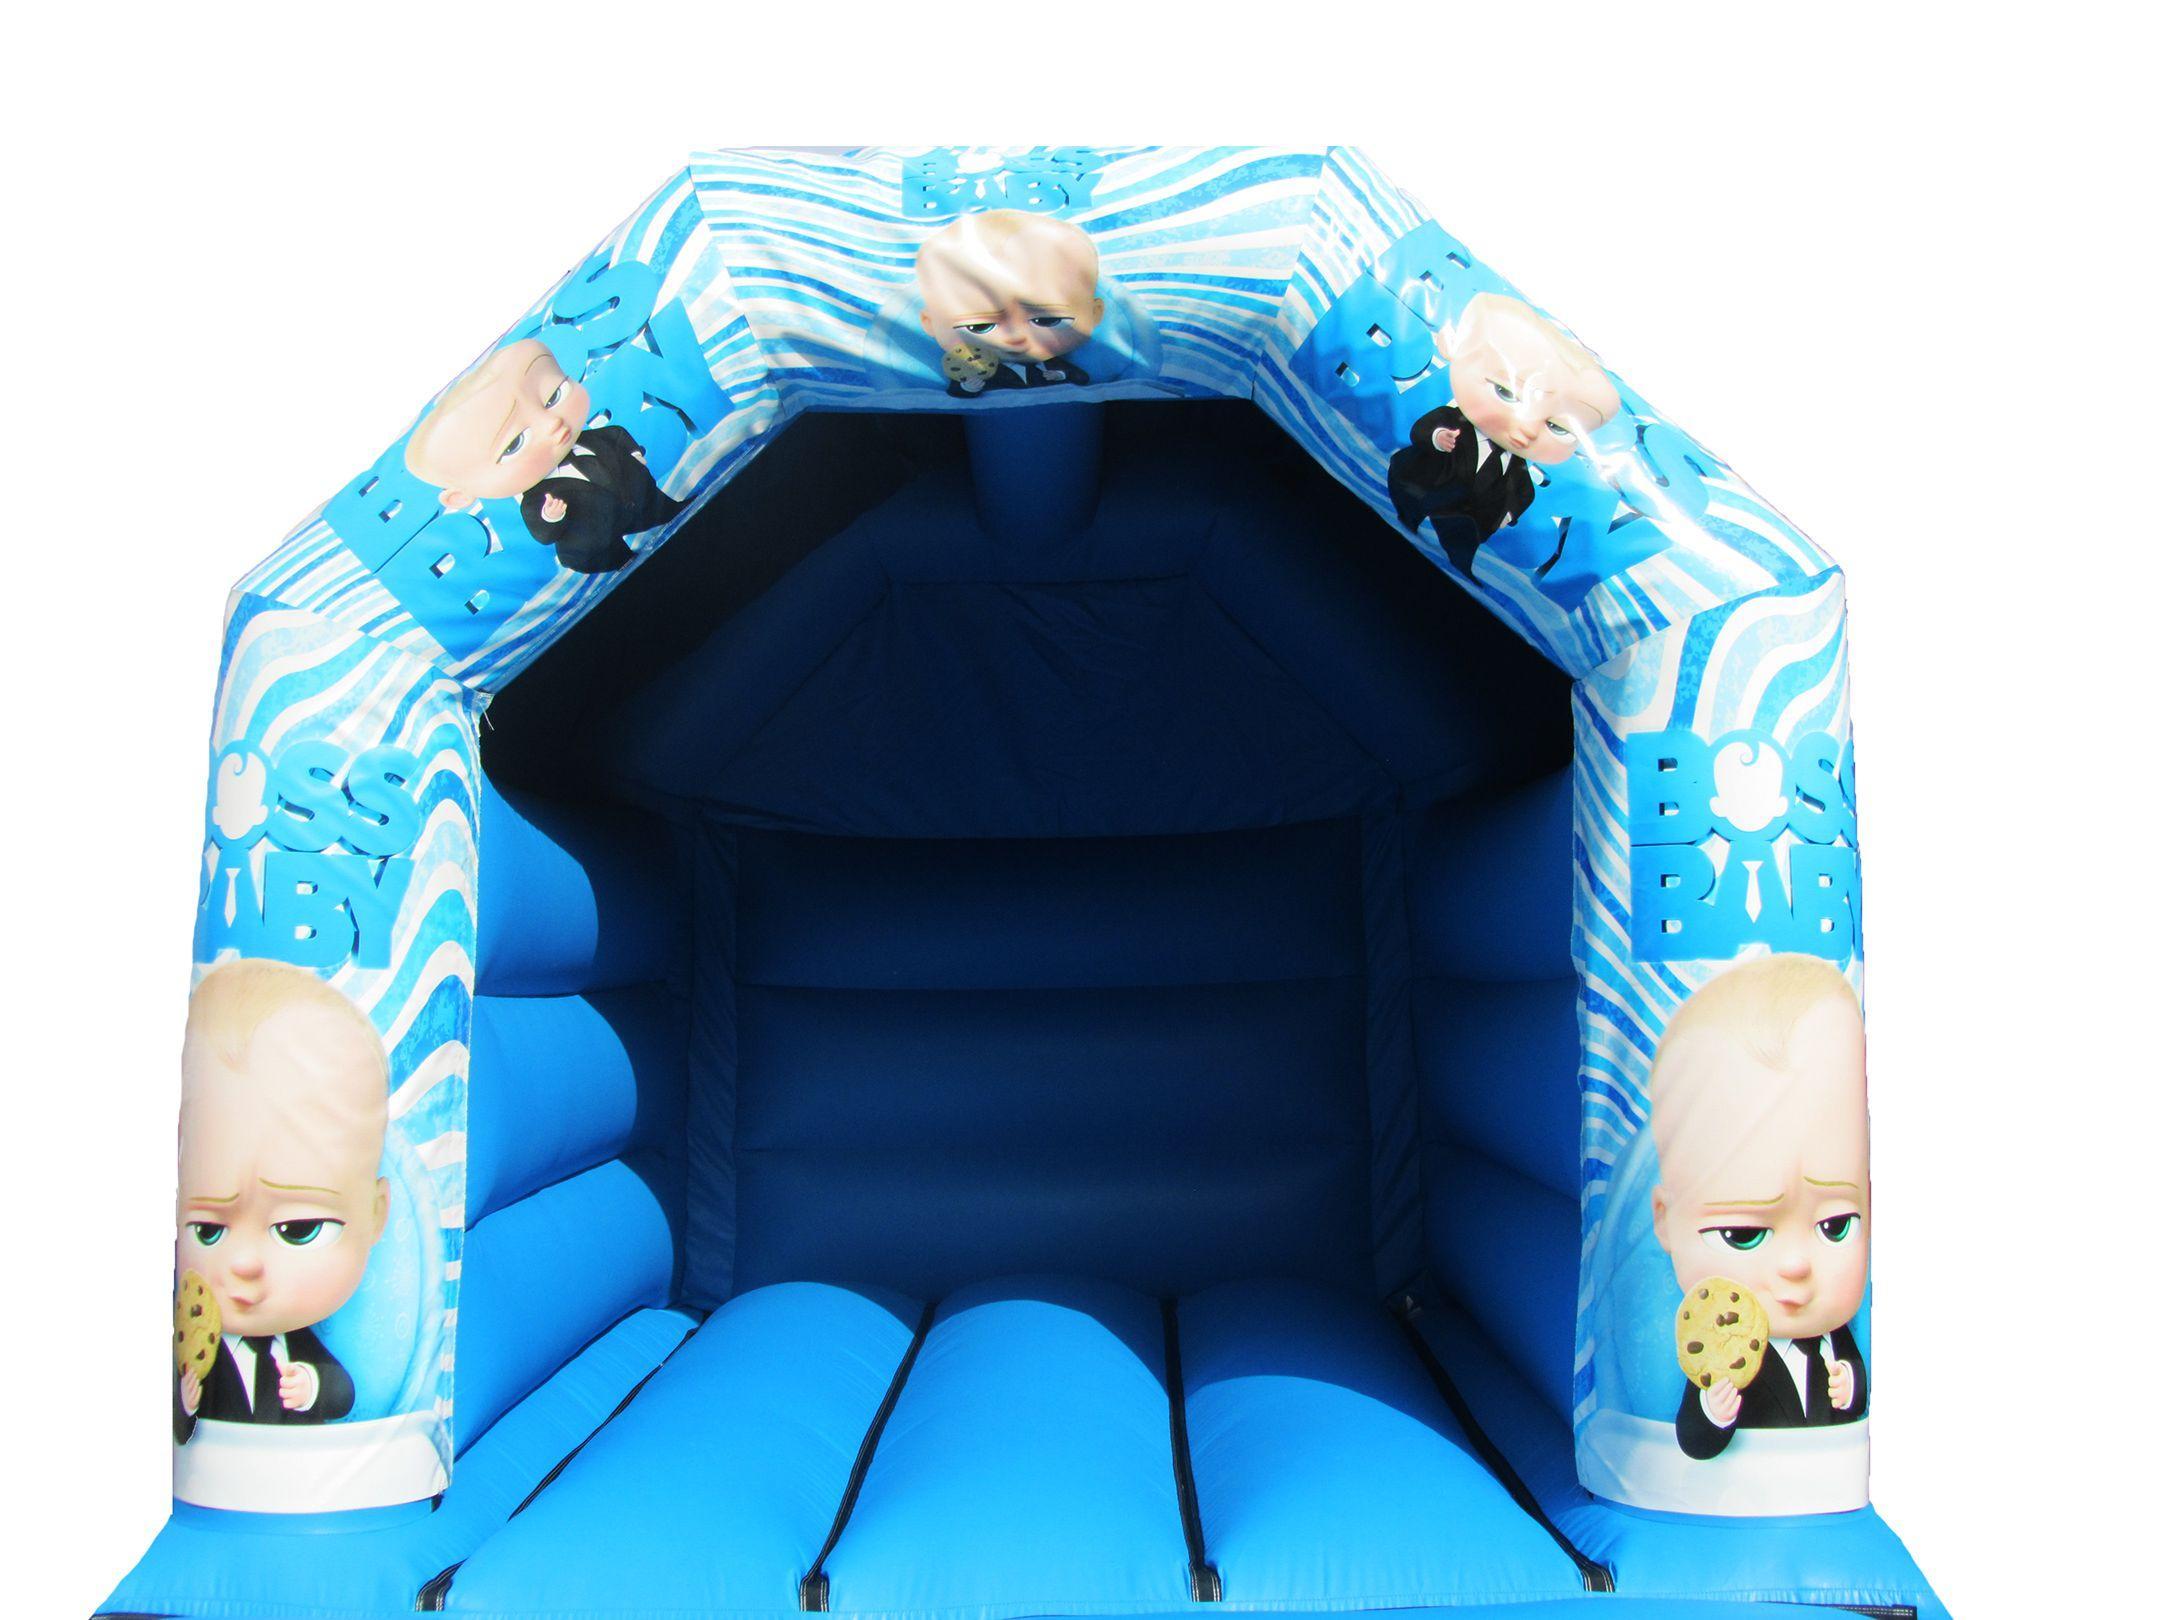 Themed Bouncy Castle for Sale